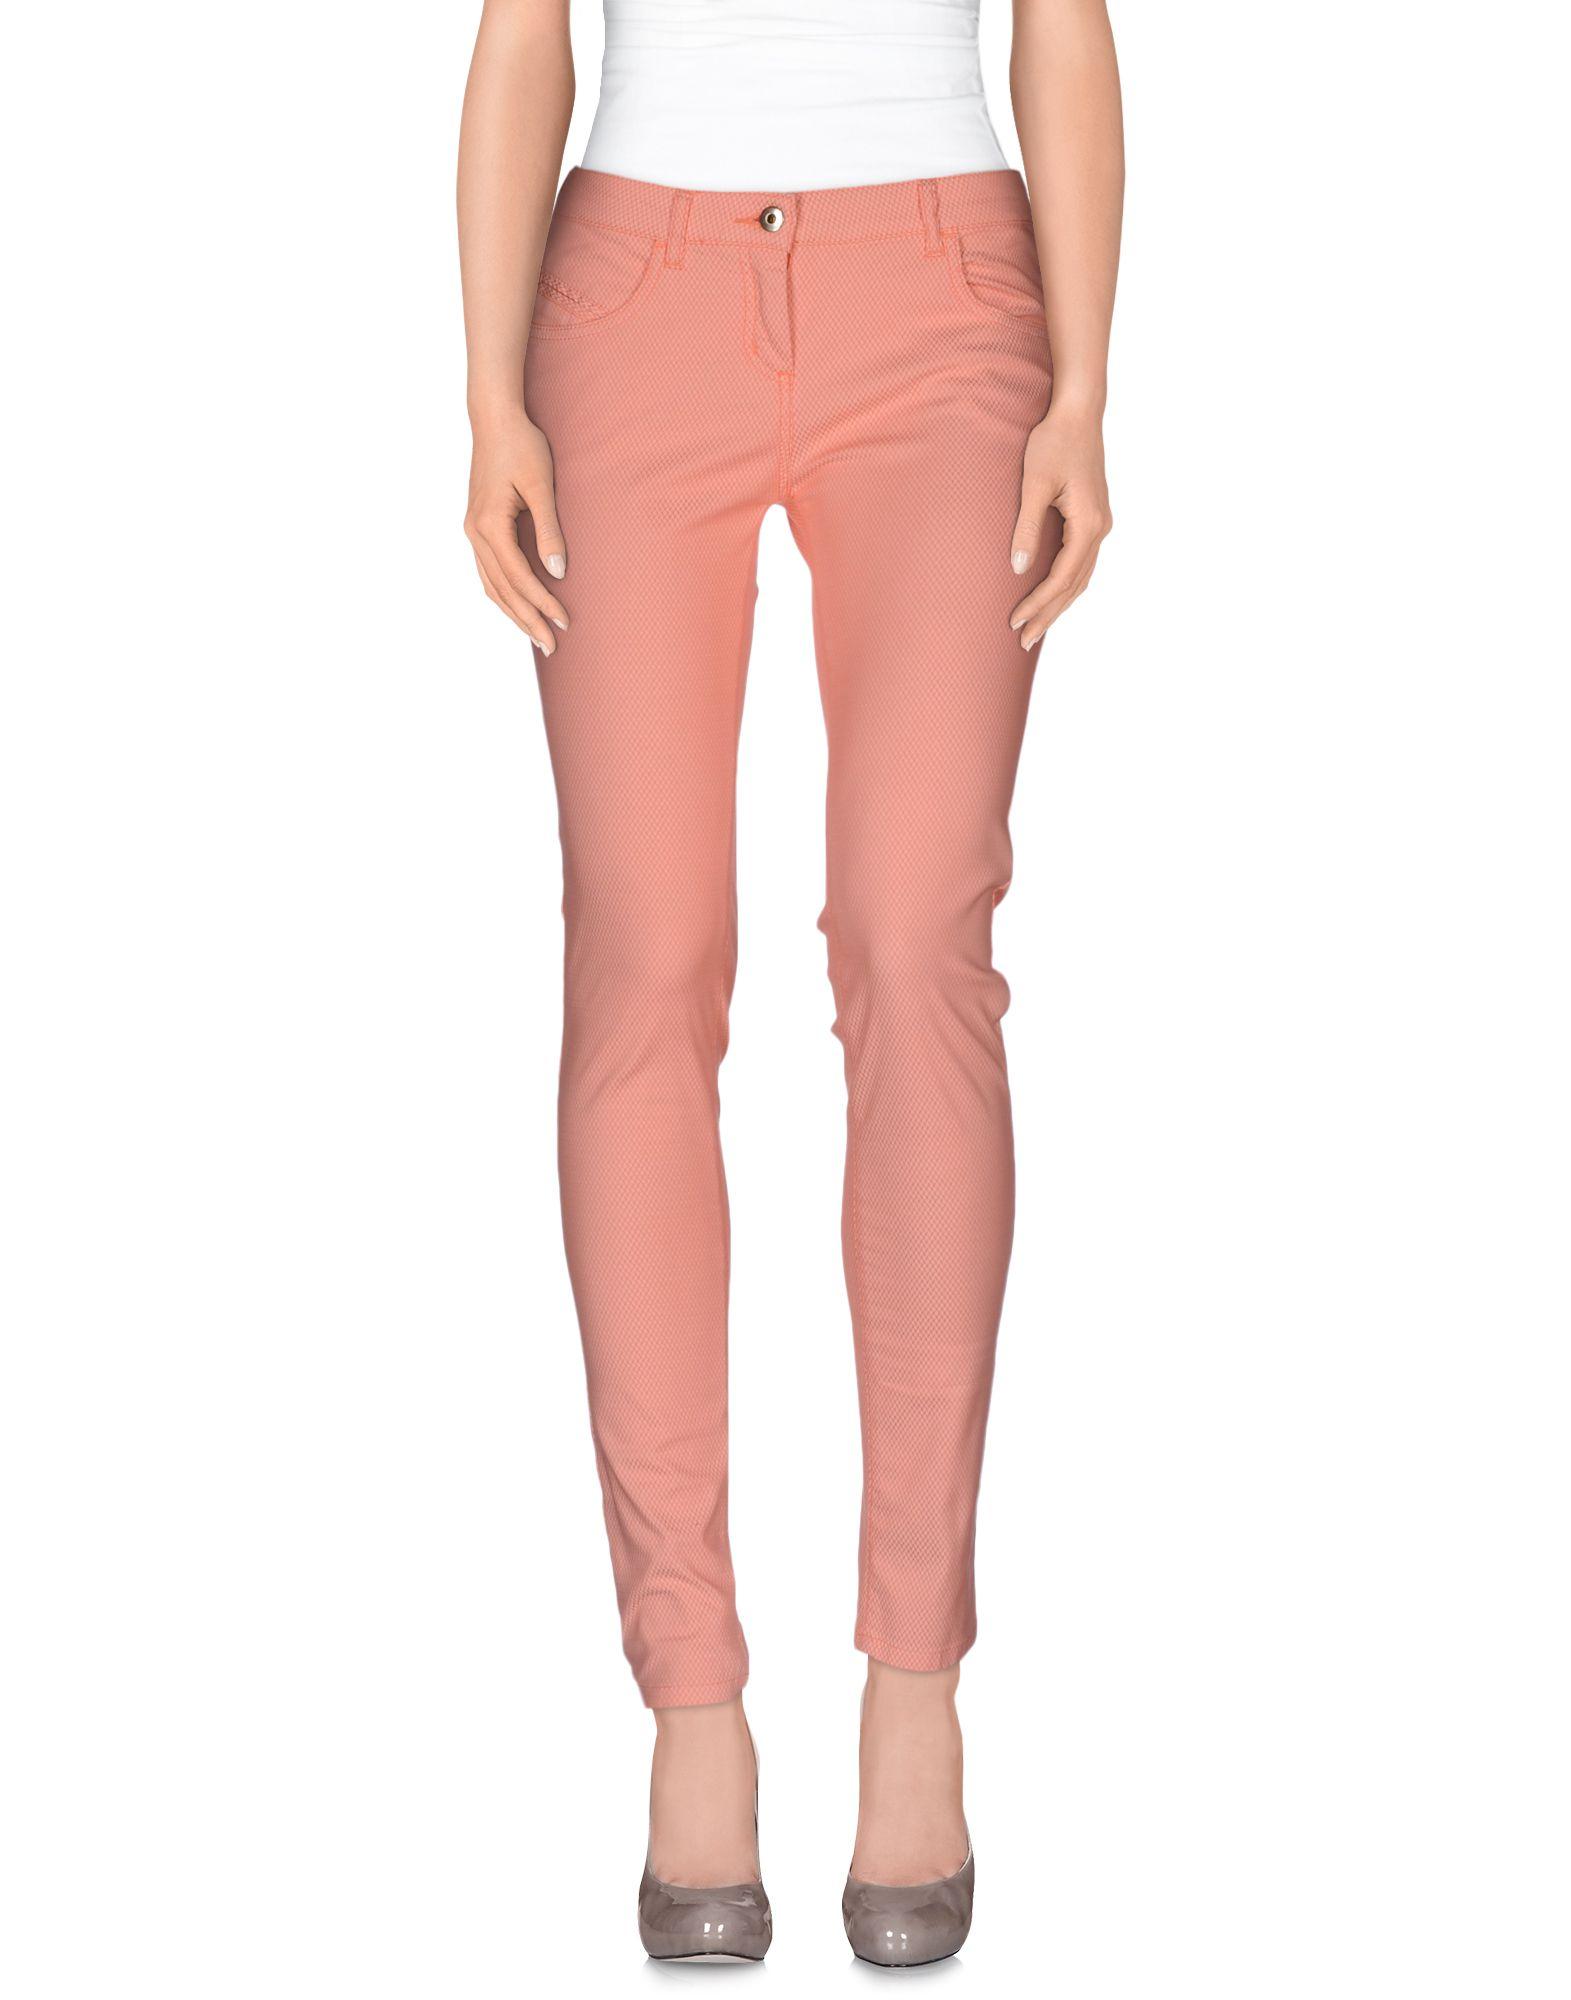 Pantalone Patrizia Pepe donna donna - 36814344EJ  preiswert kaufen